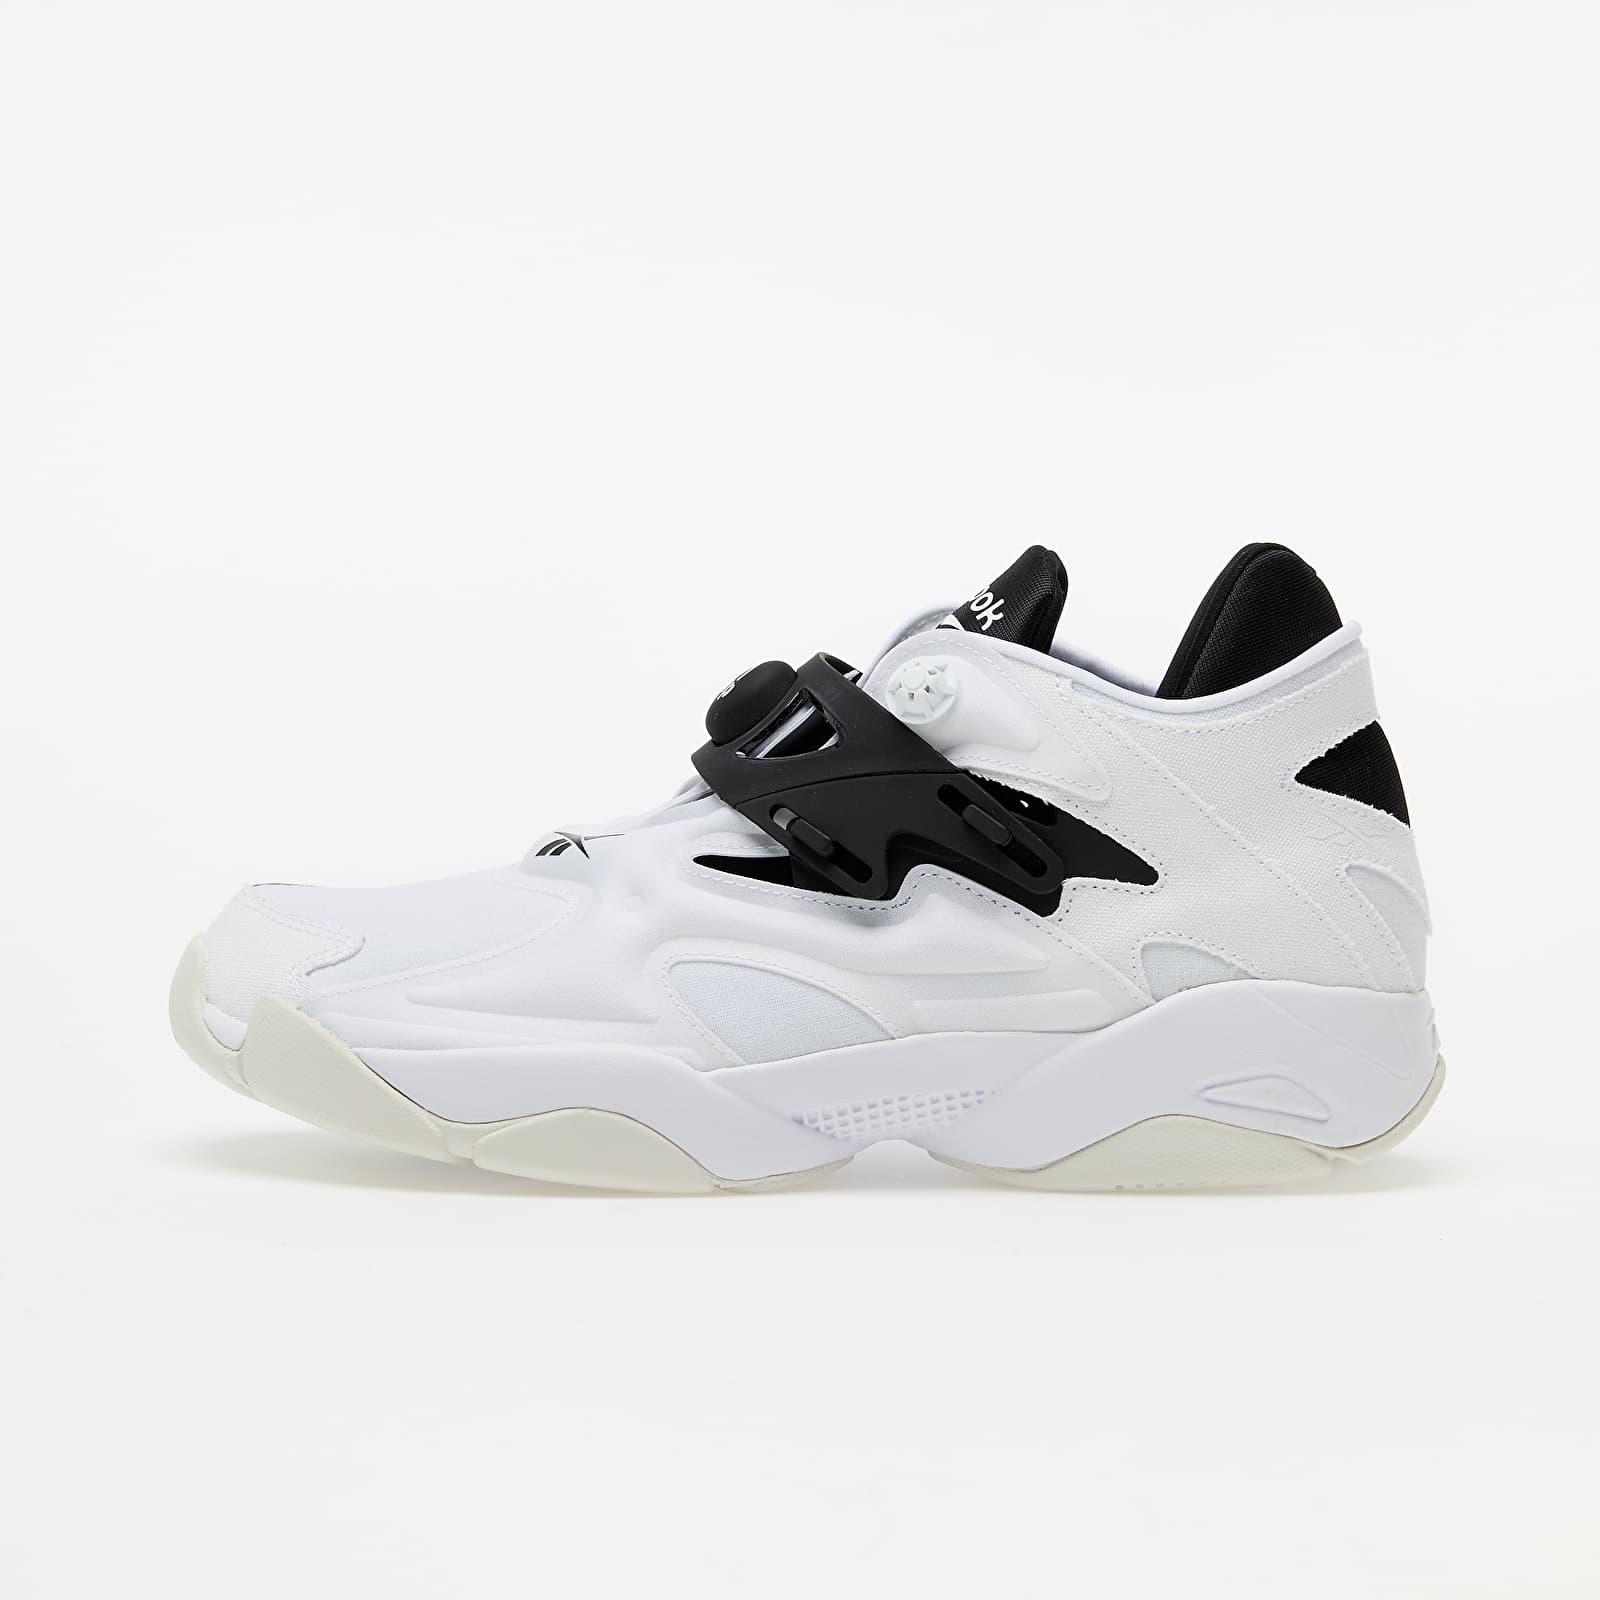 Reebok Pump Court White/ Black/ Trace Grey 1 FW7817